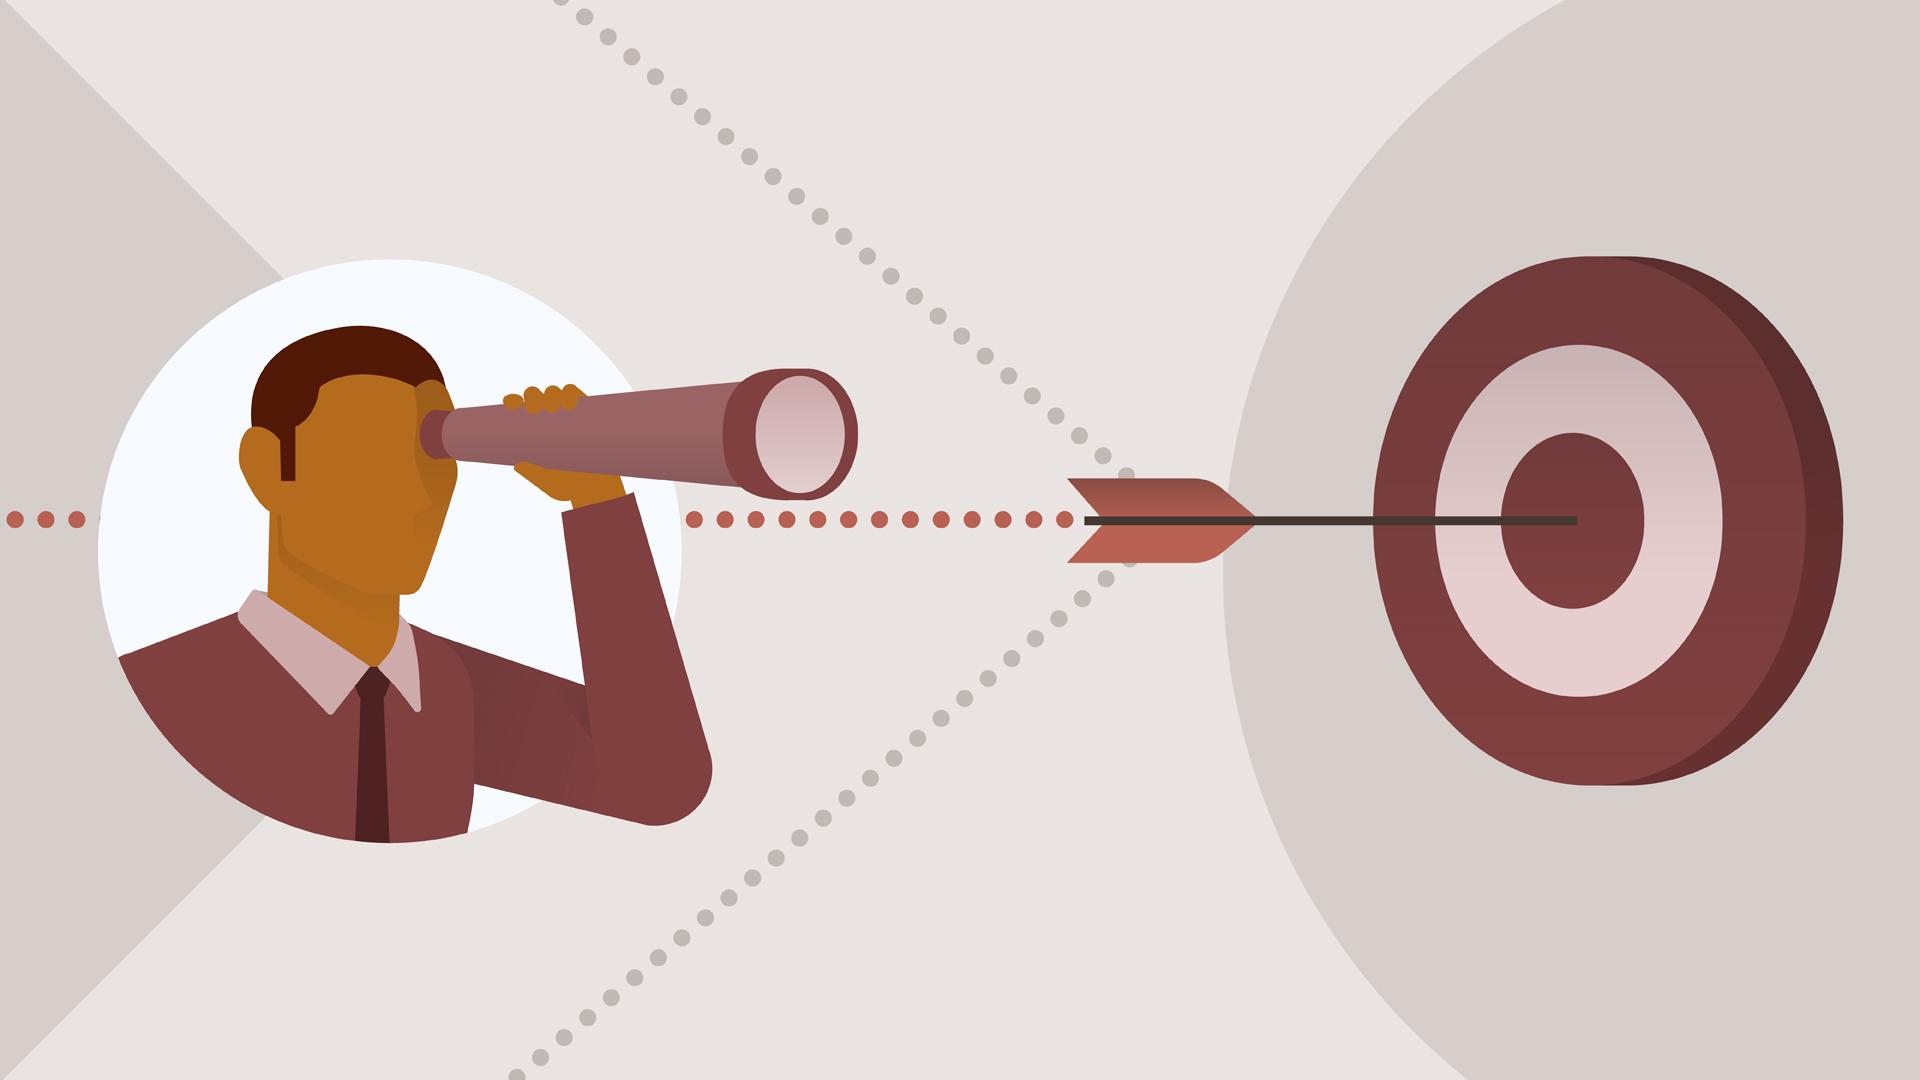 Man looking through telescope at a target